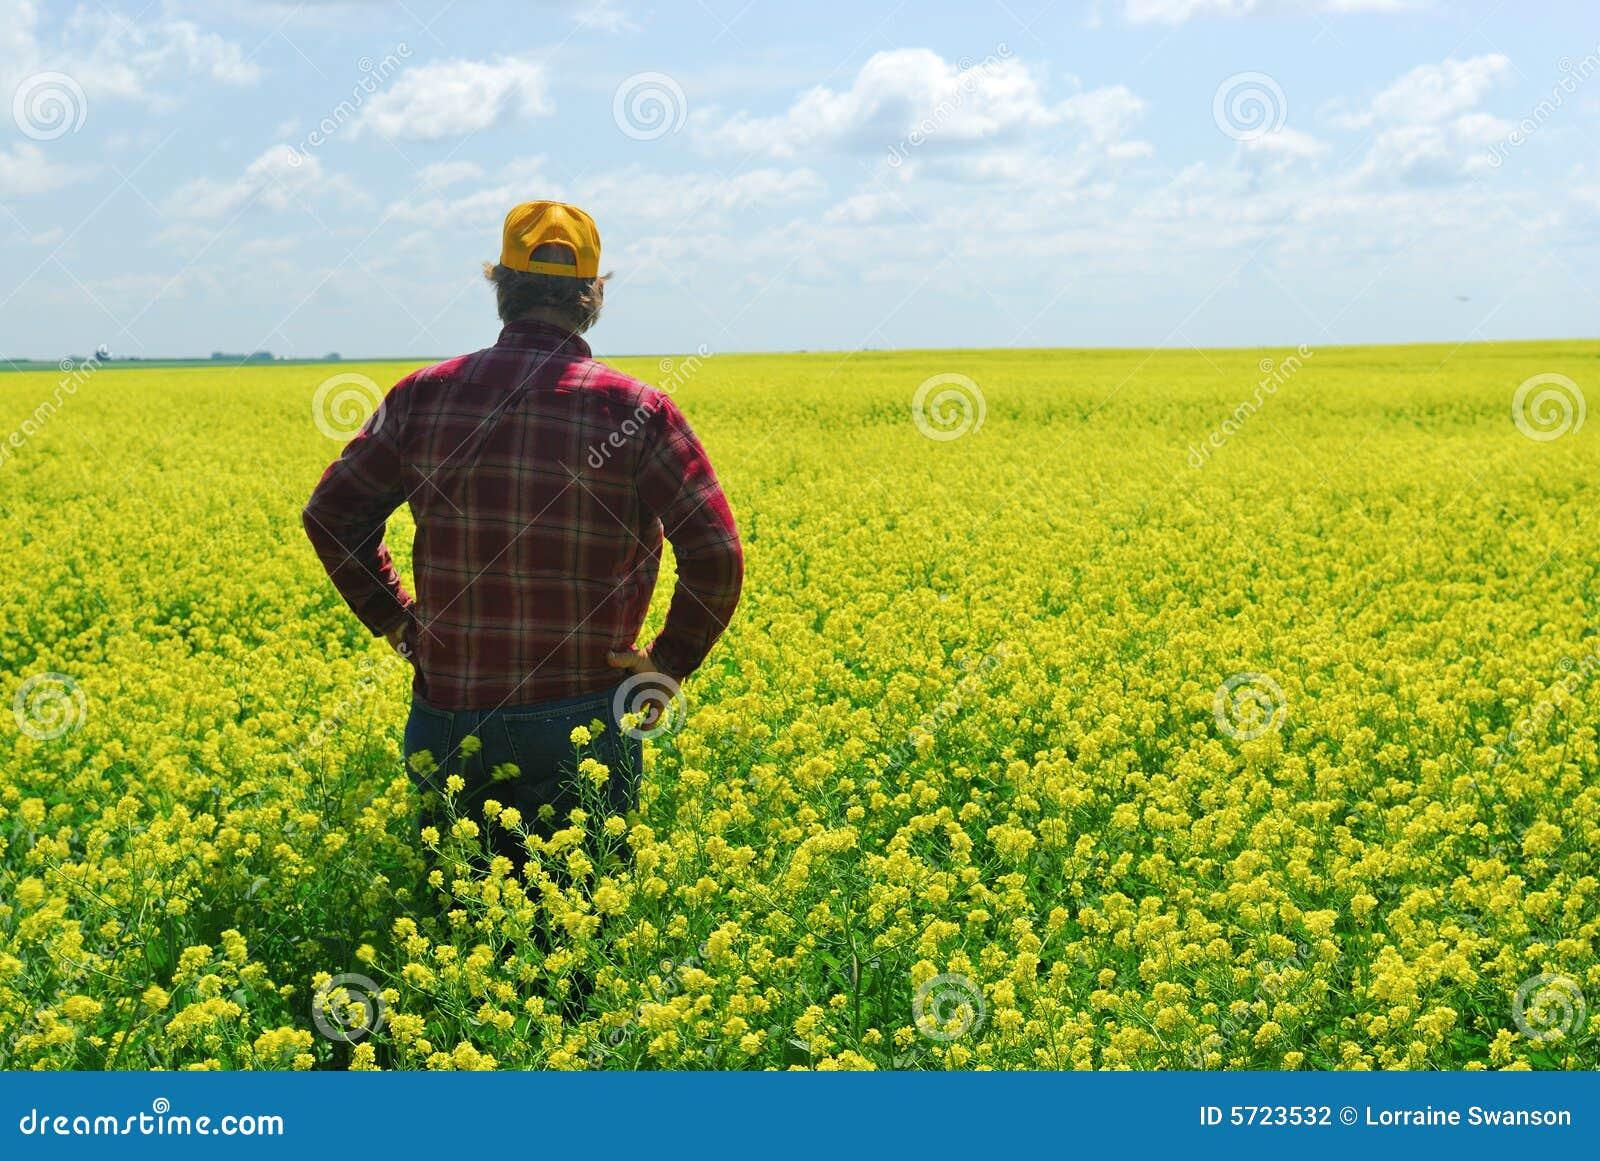 Download Farmer in Canola Crop stock photo. Image of farm, pixart - 5723532